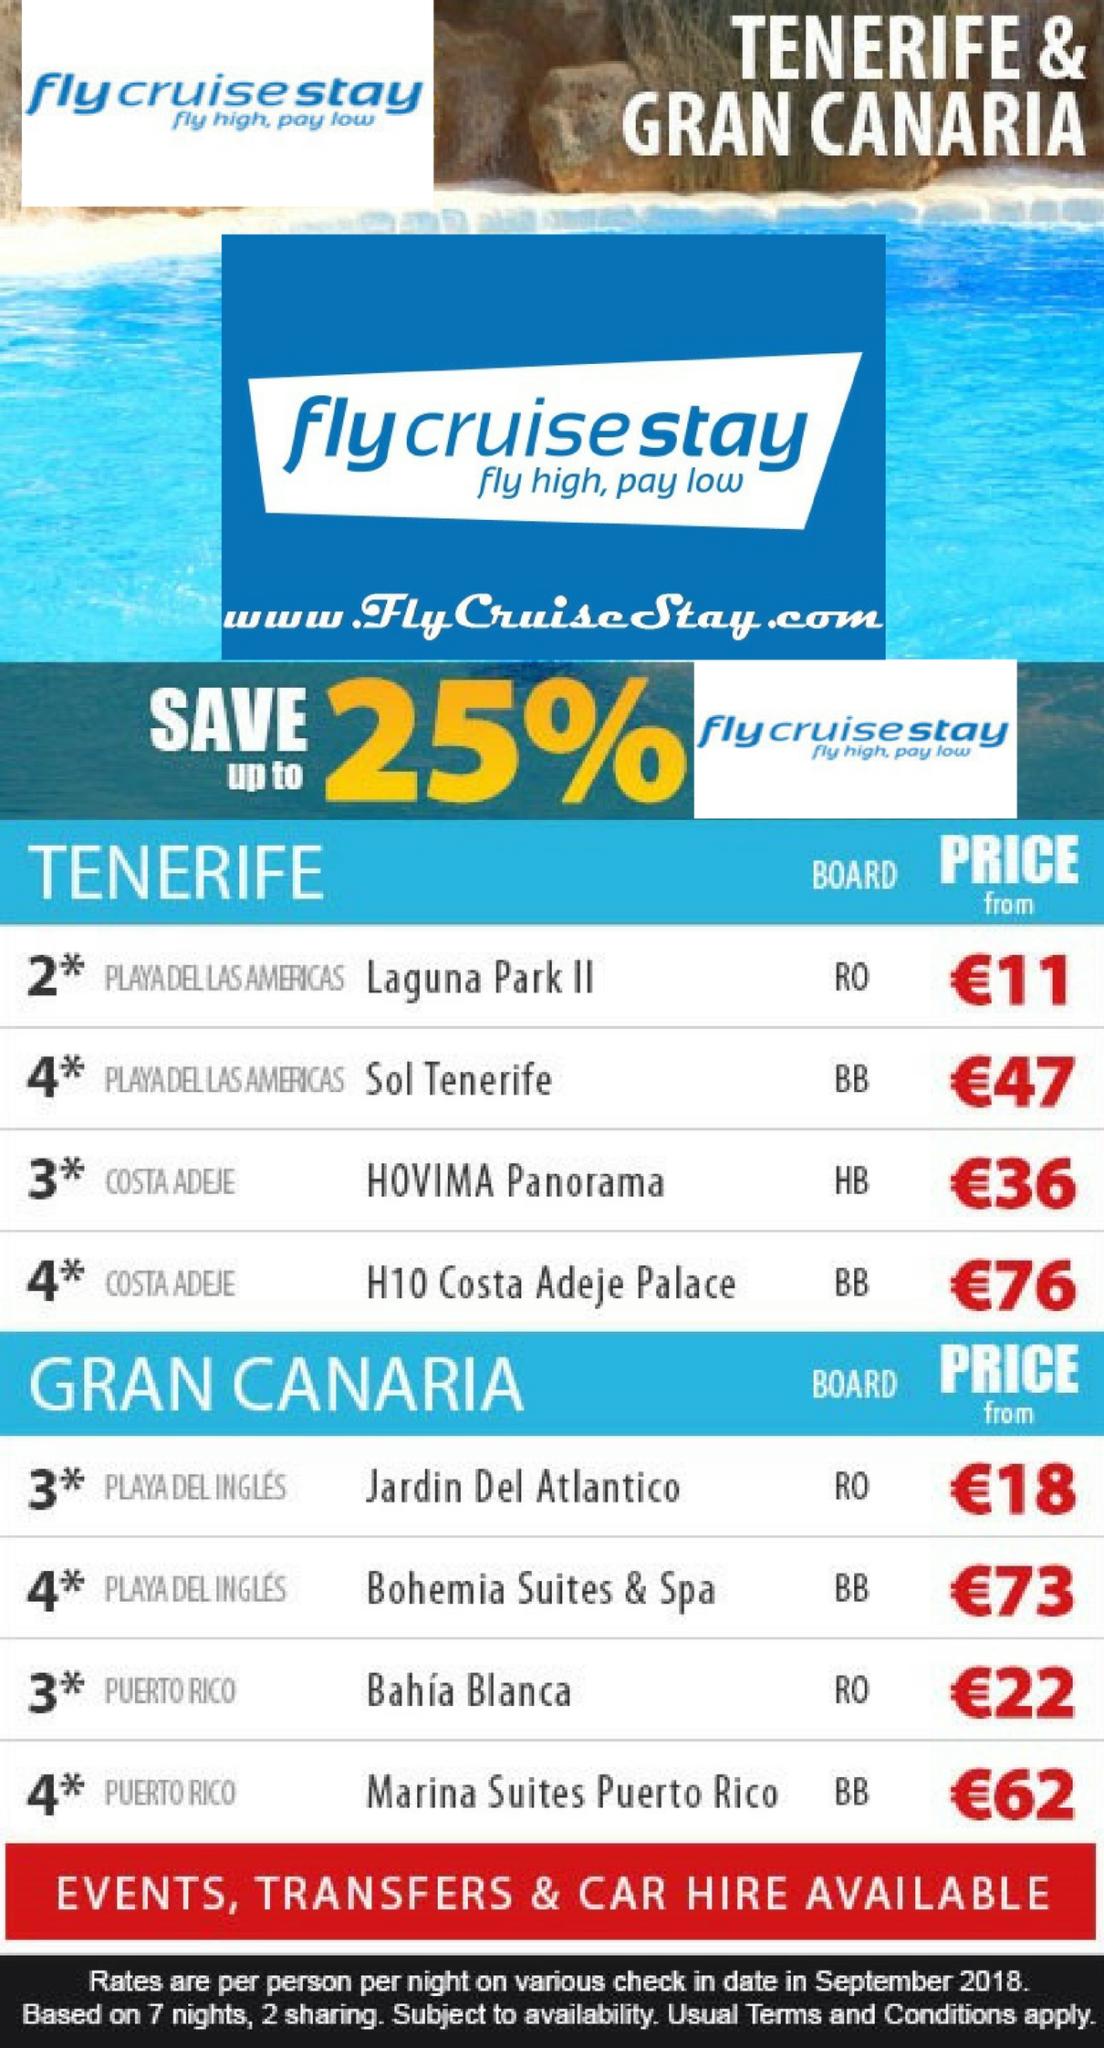 Gran Canaira hotels